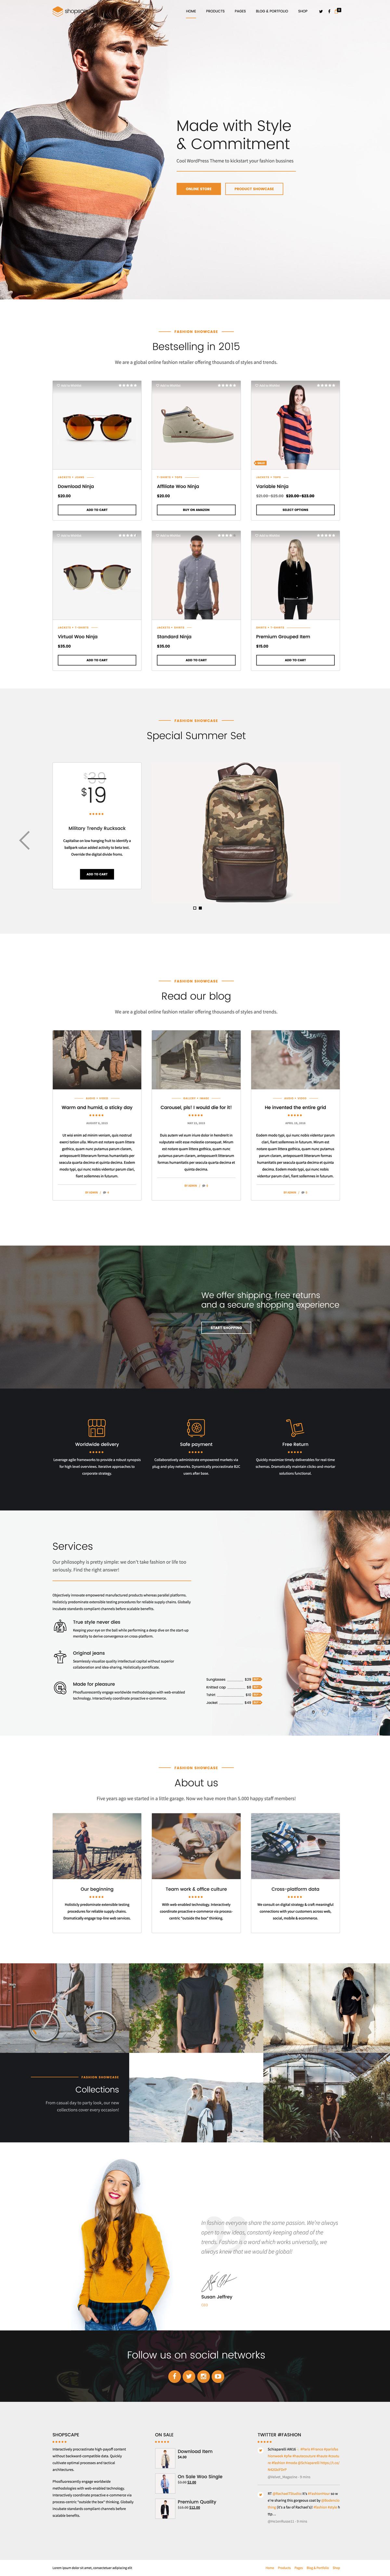 Shopscape - Single Product & WooCommerce Shop Theme